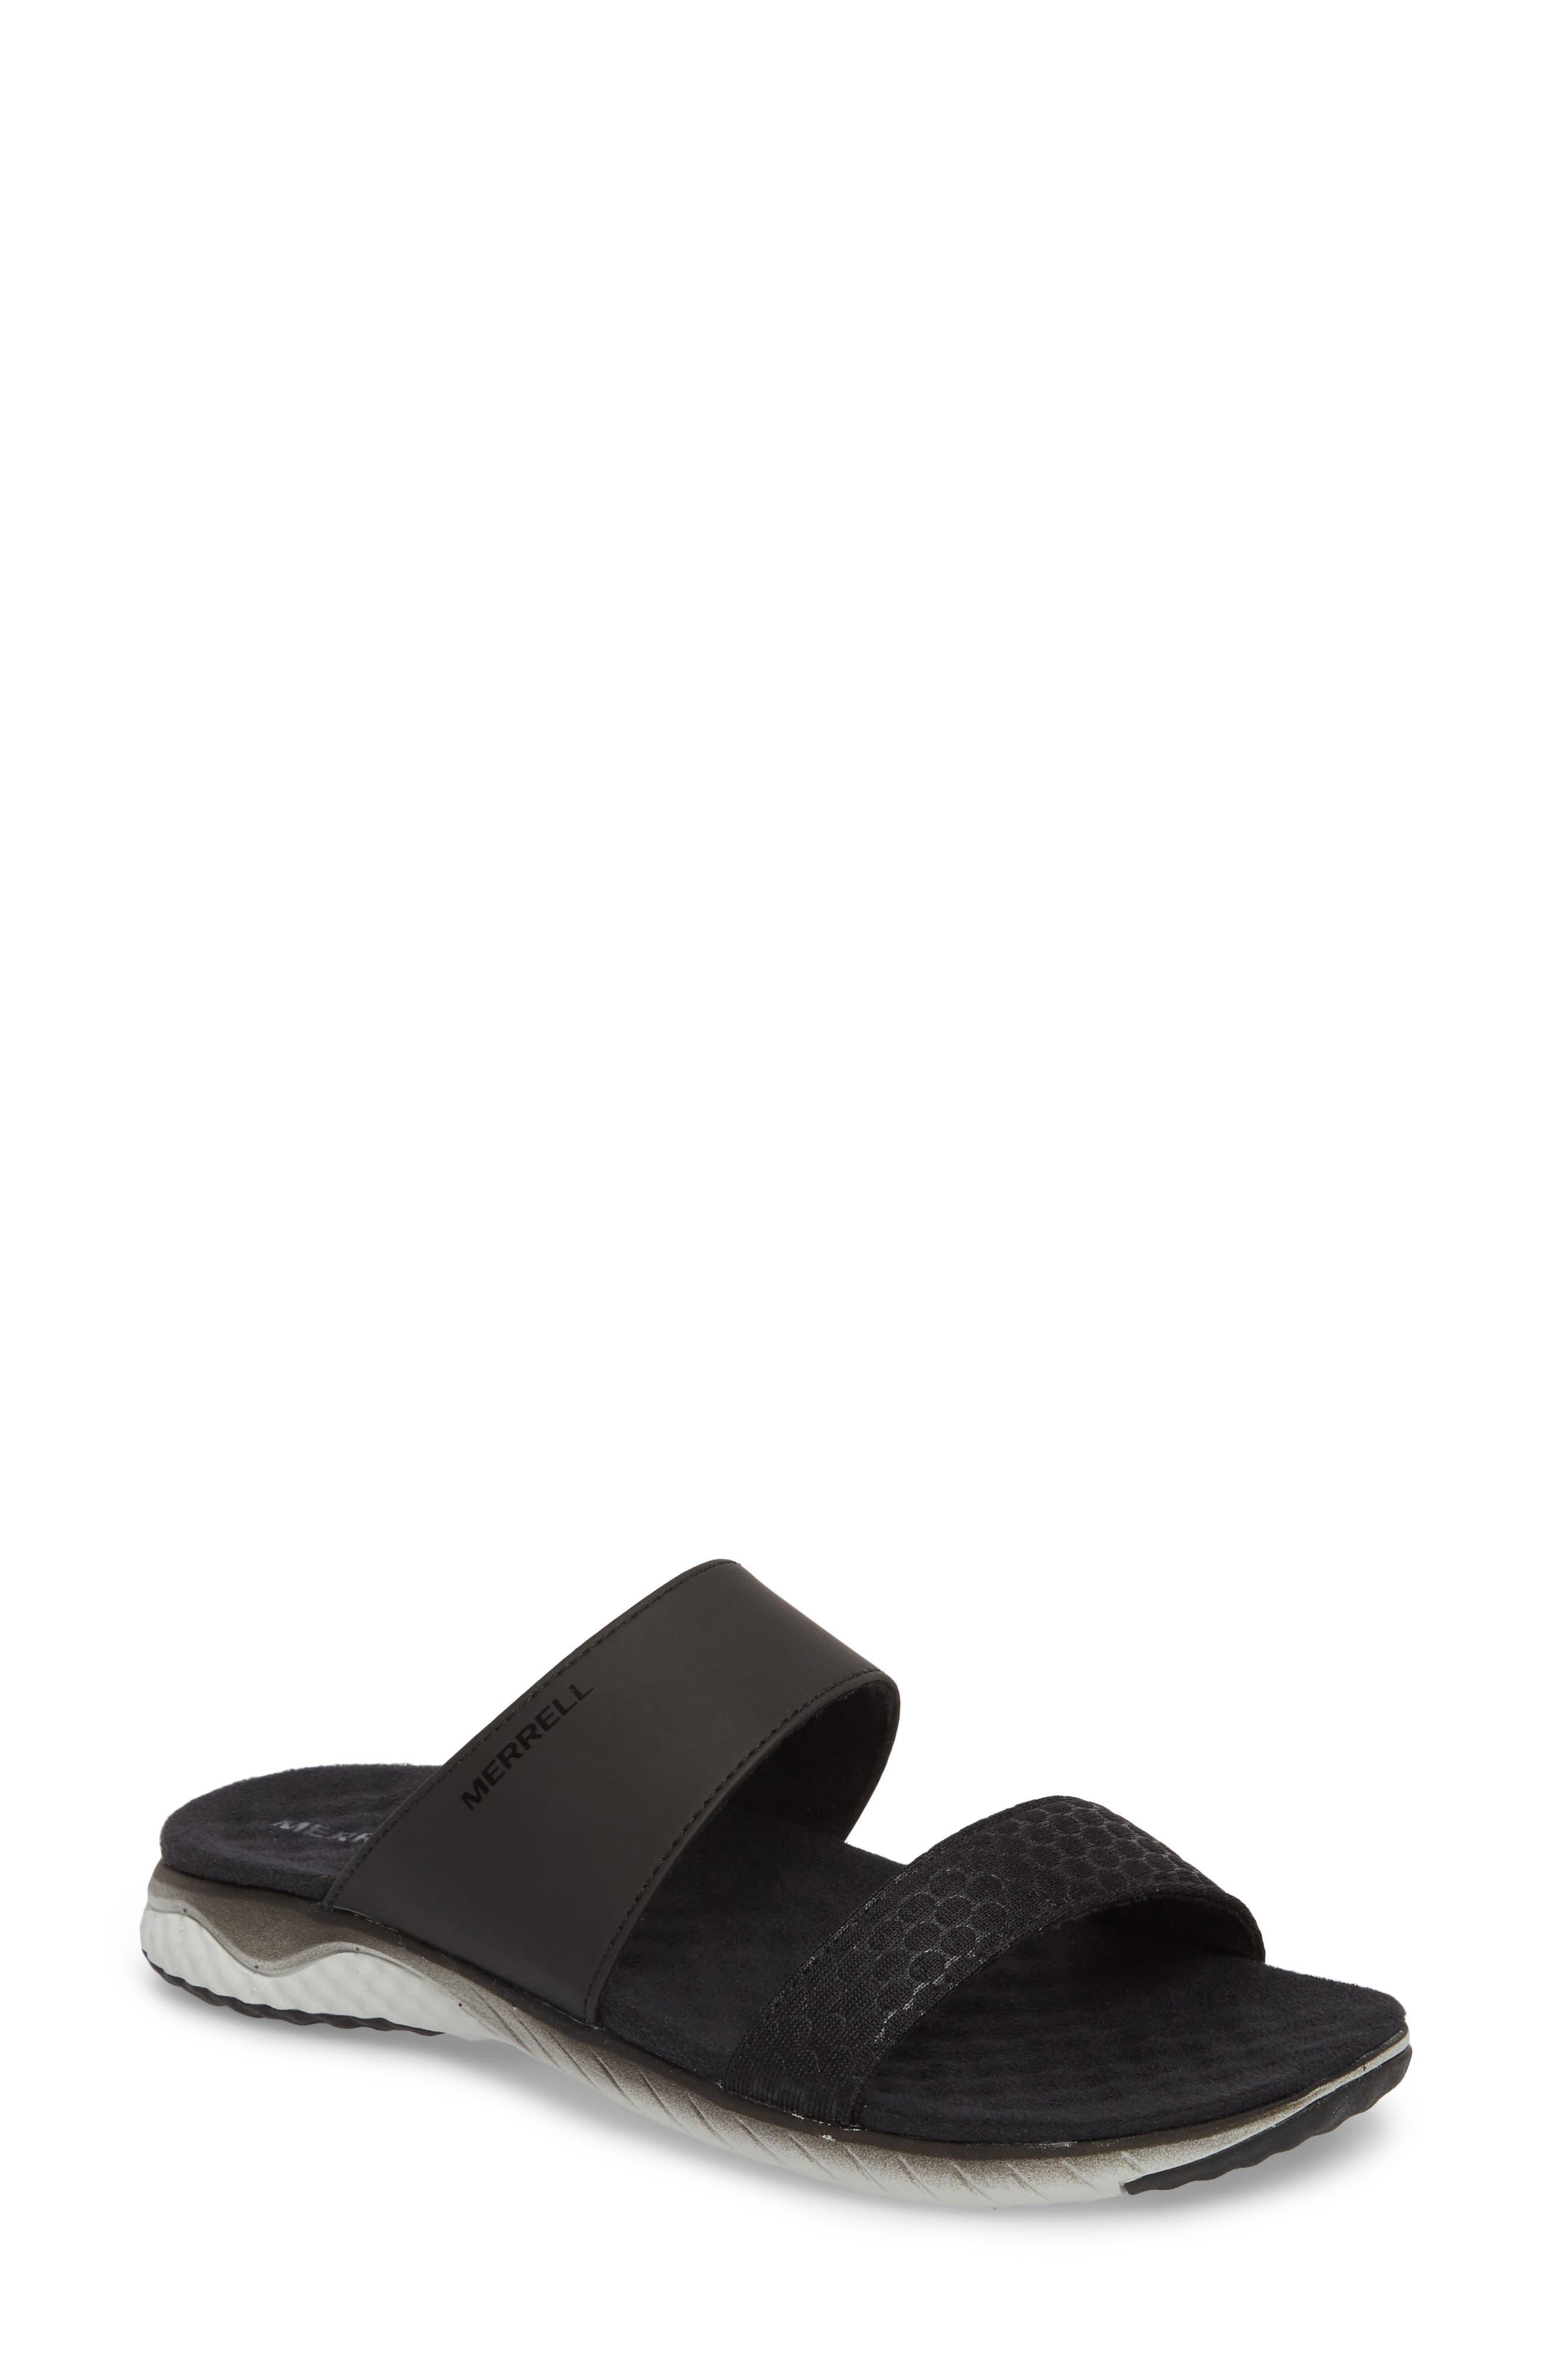 1SIX8 Linna Air Cushion+ Slide Sandal,                         Main,                         color, Black